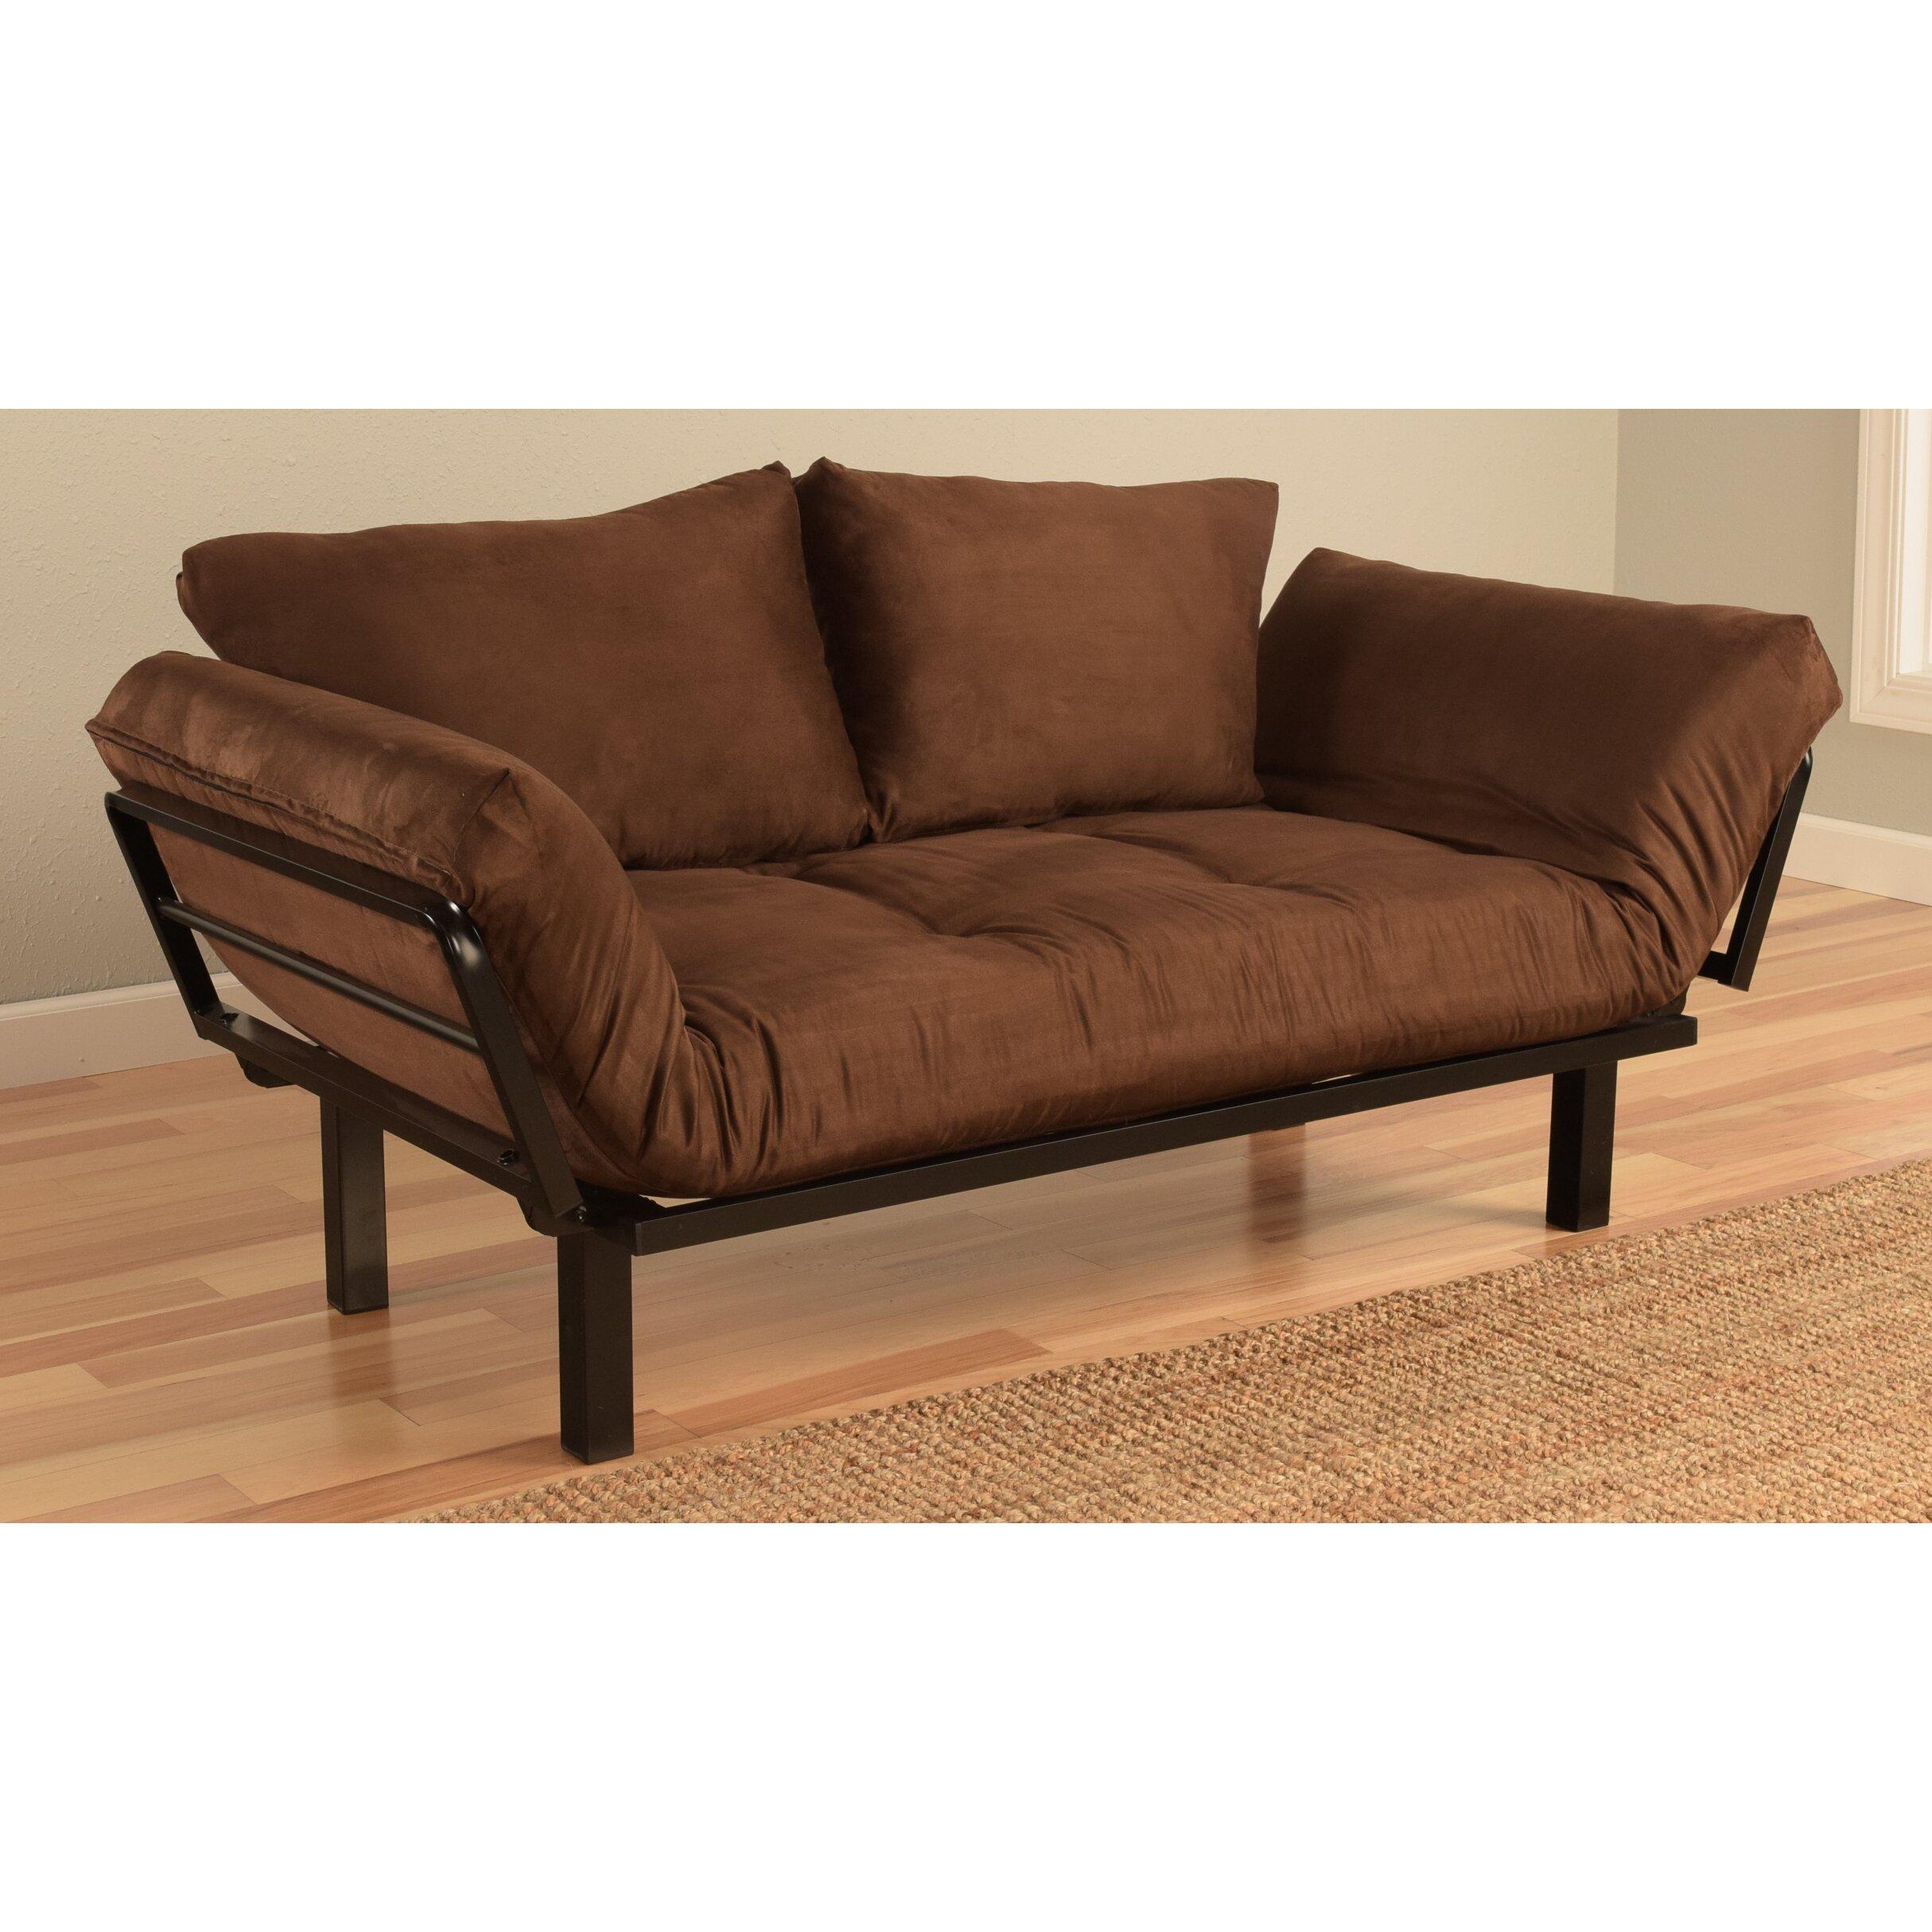 kodiak furniture spacely convertible futon lounger and mattress outdoor futon lounger   roselawnlutheran  rh   roselawnlutheran org